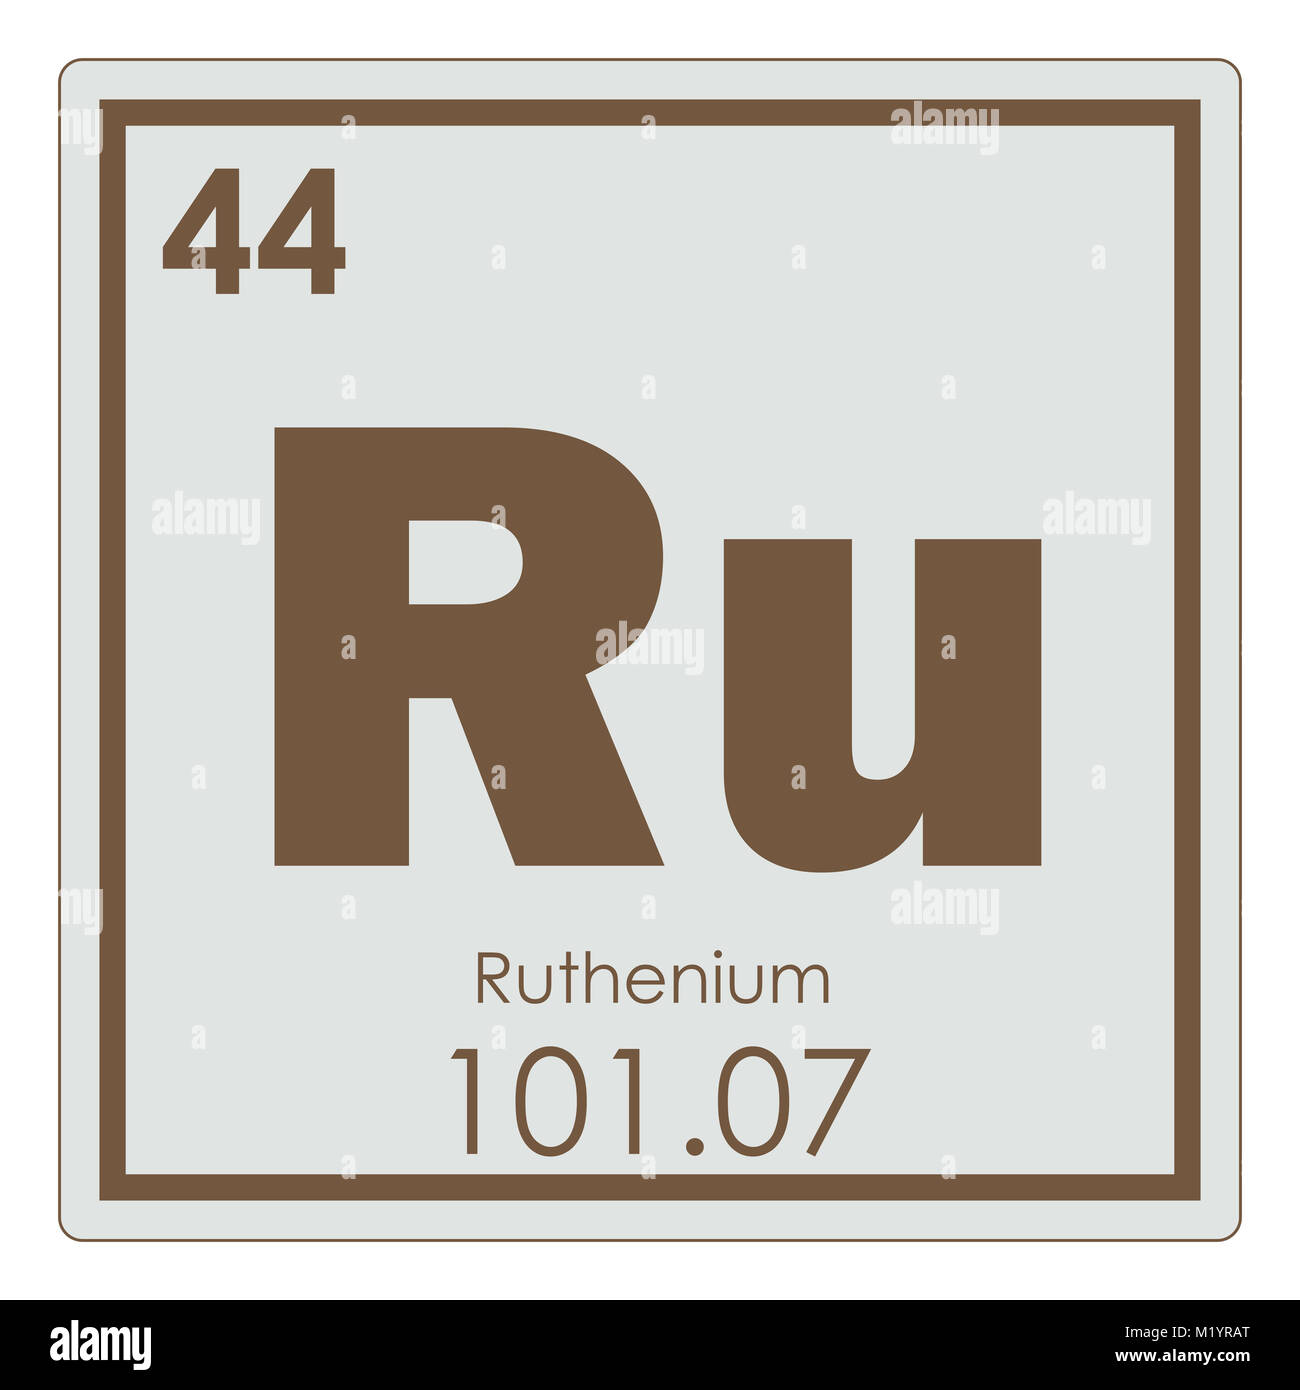 Ruthenium Chemical Element Periodic Table Science Symbol Stock Photo